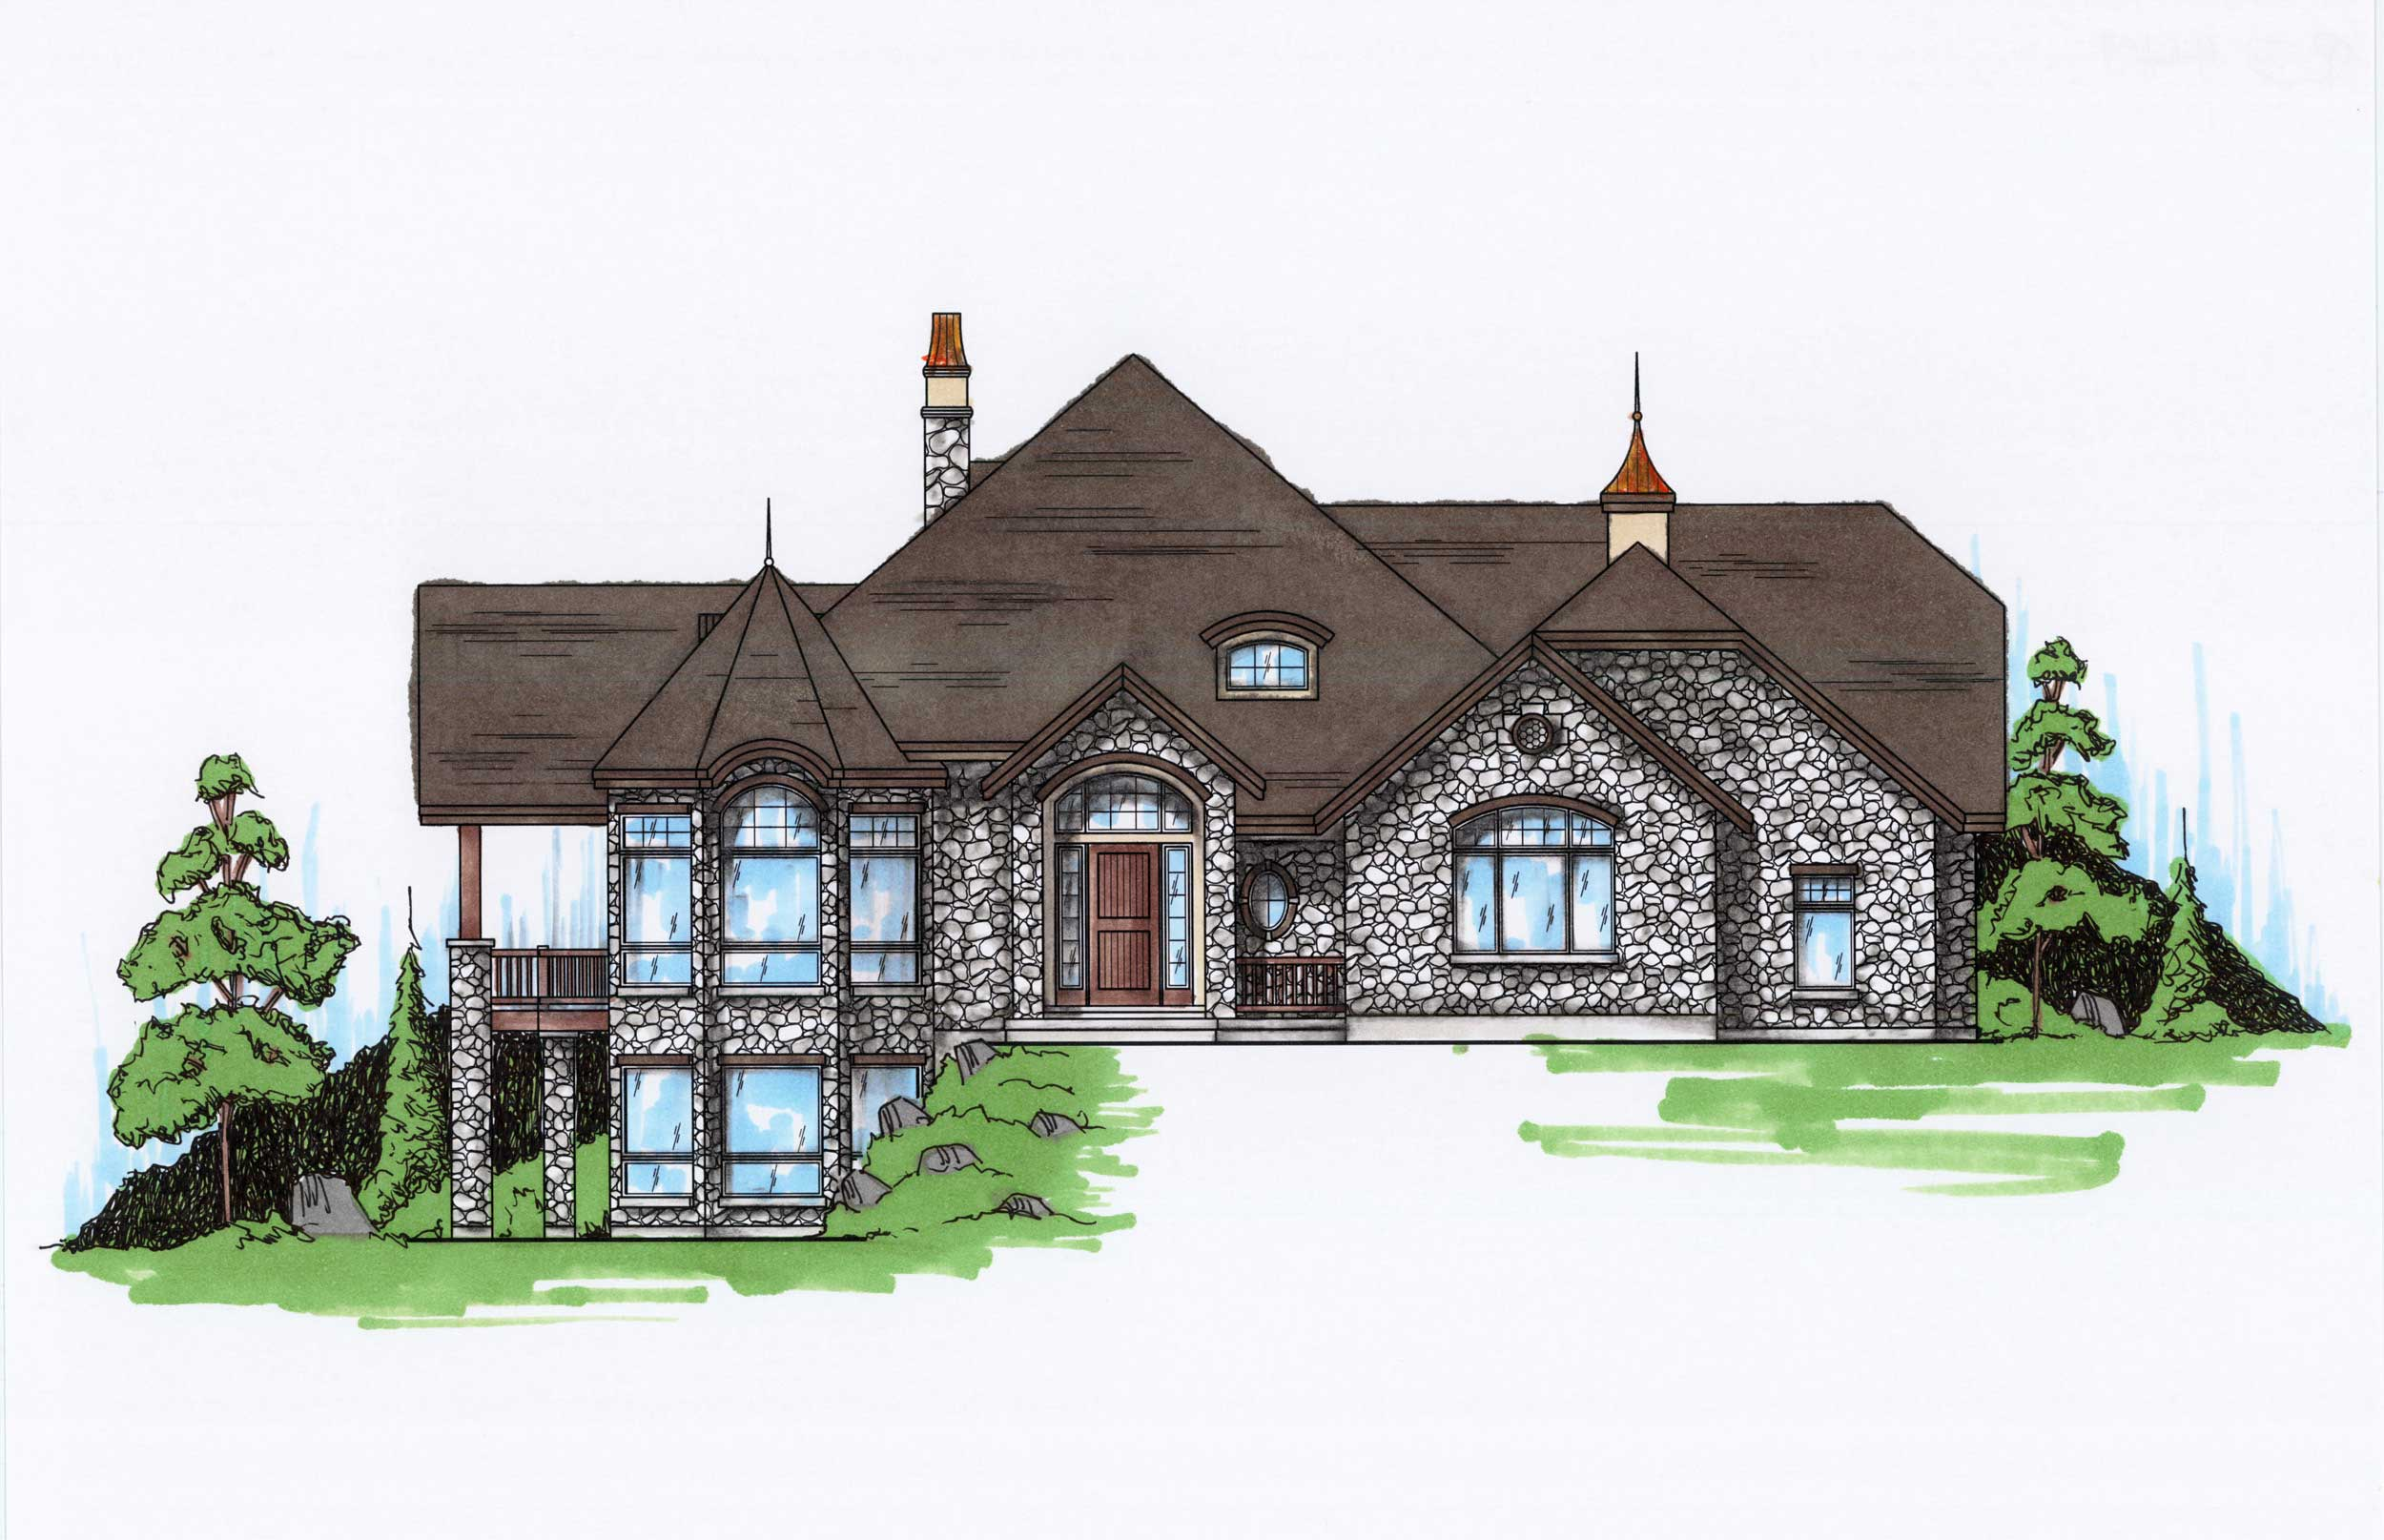 European luxury house plans home design vh r3449 for European luxury house plans